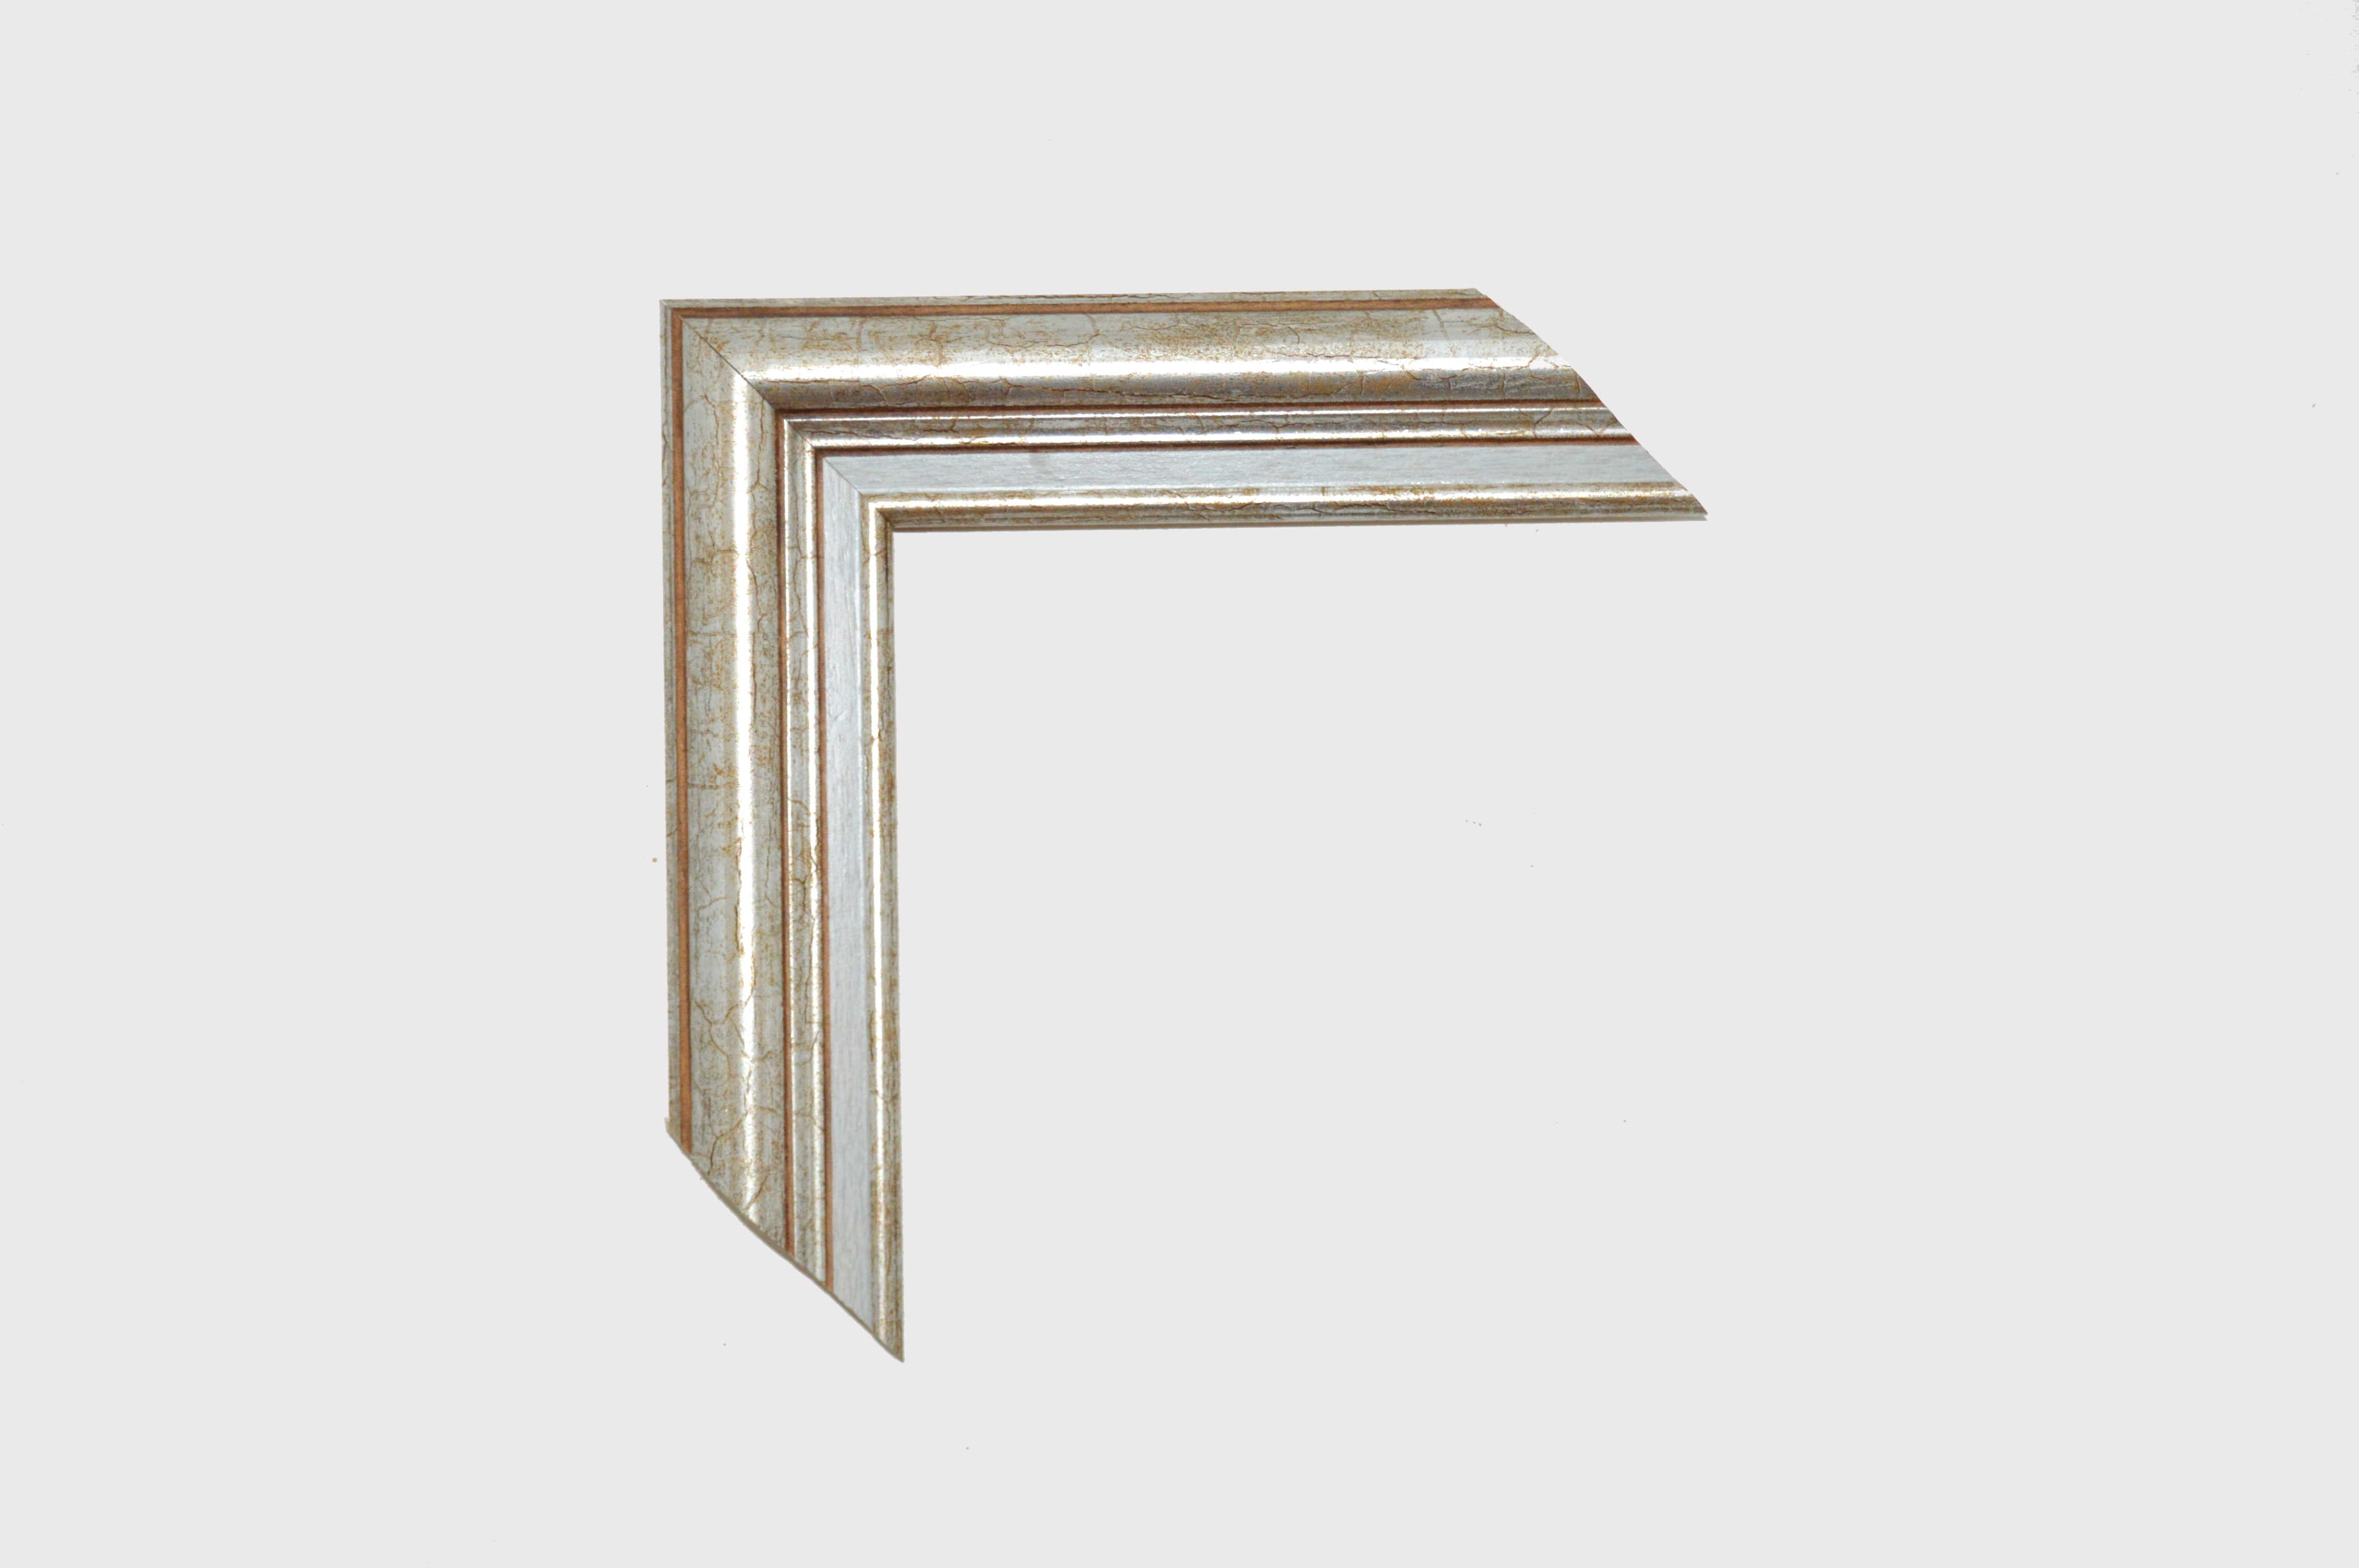 00743-759-plata-ancho4.3cm